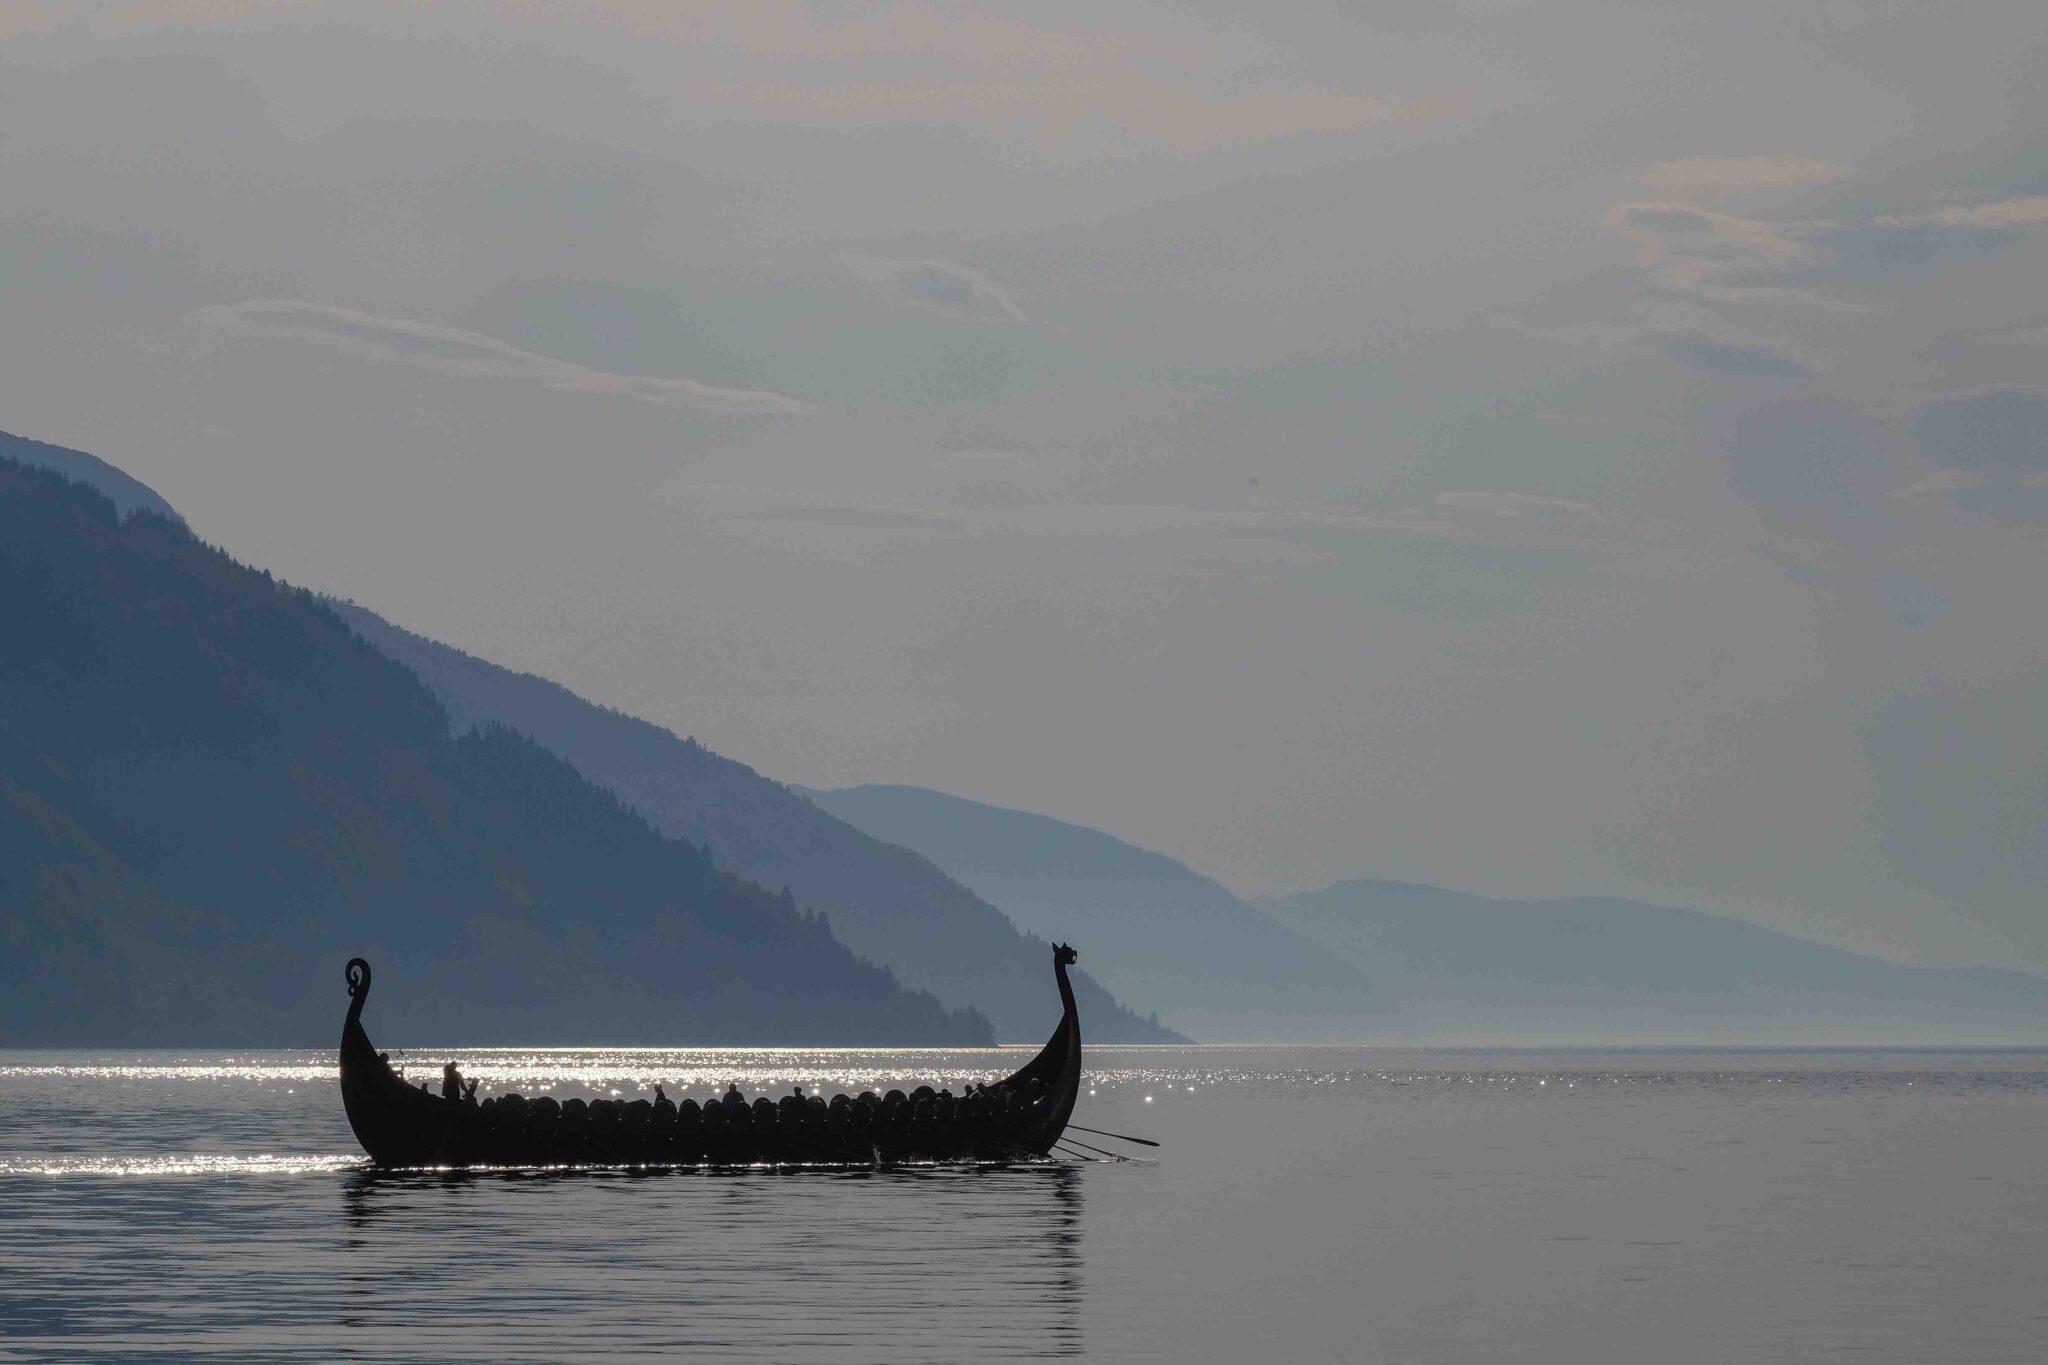 Barco vikingo navegando con brújula vikinga.